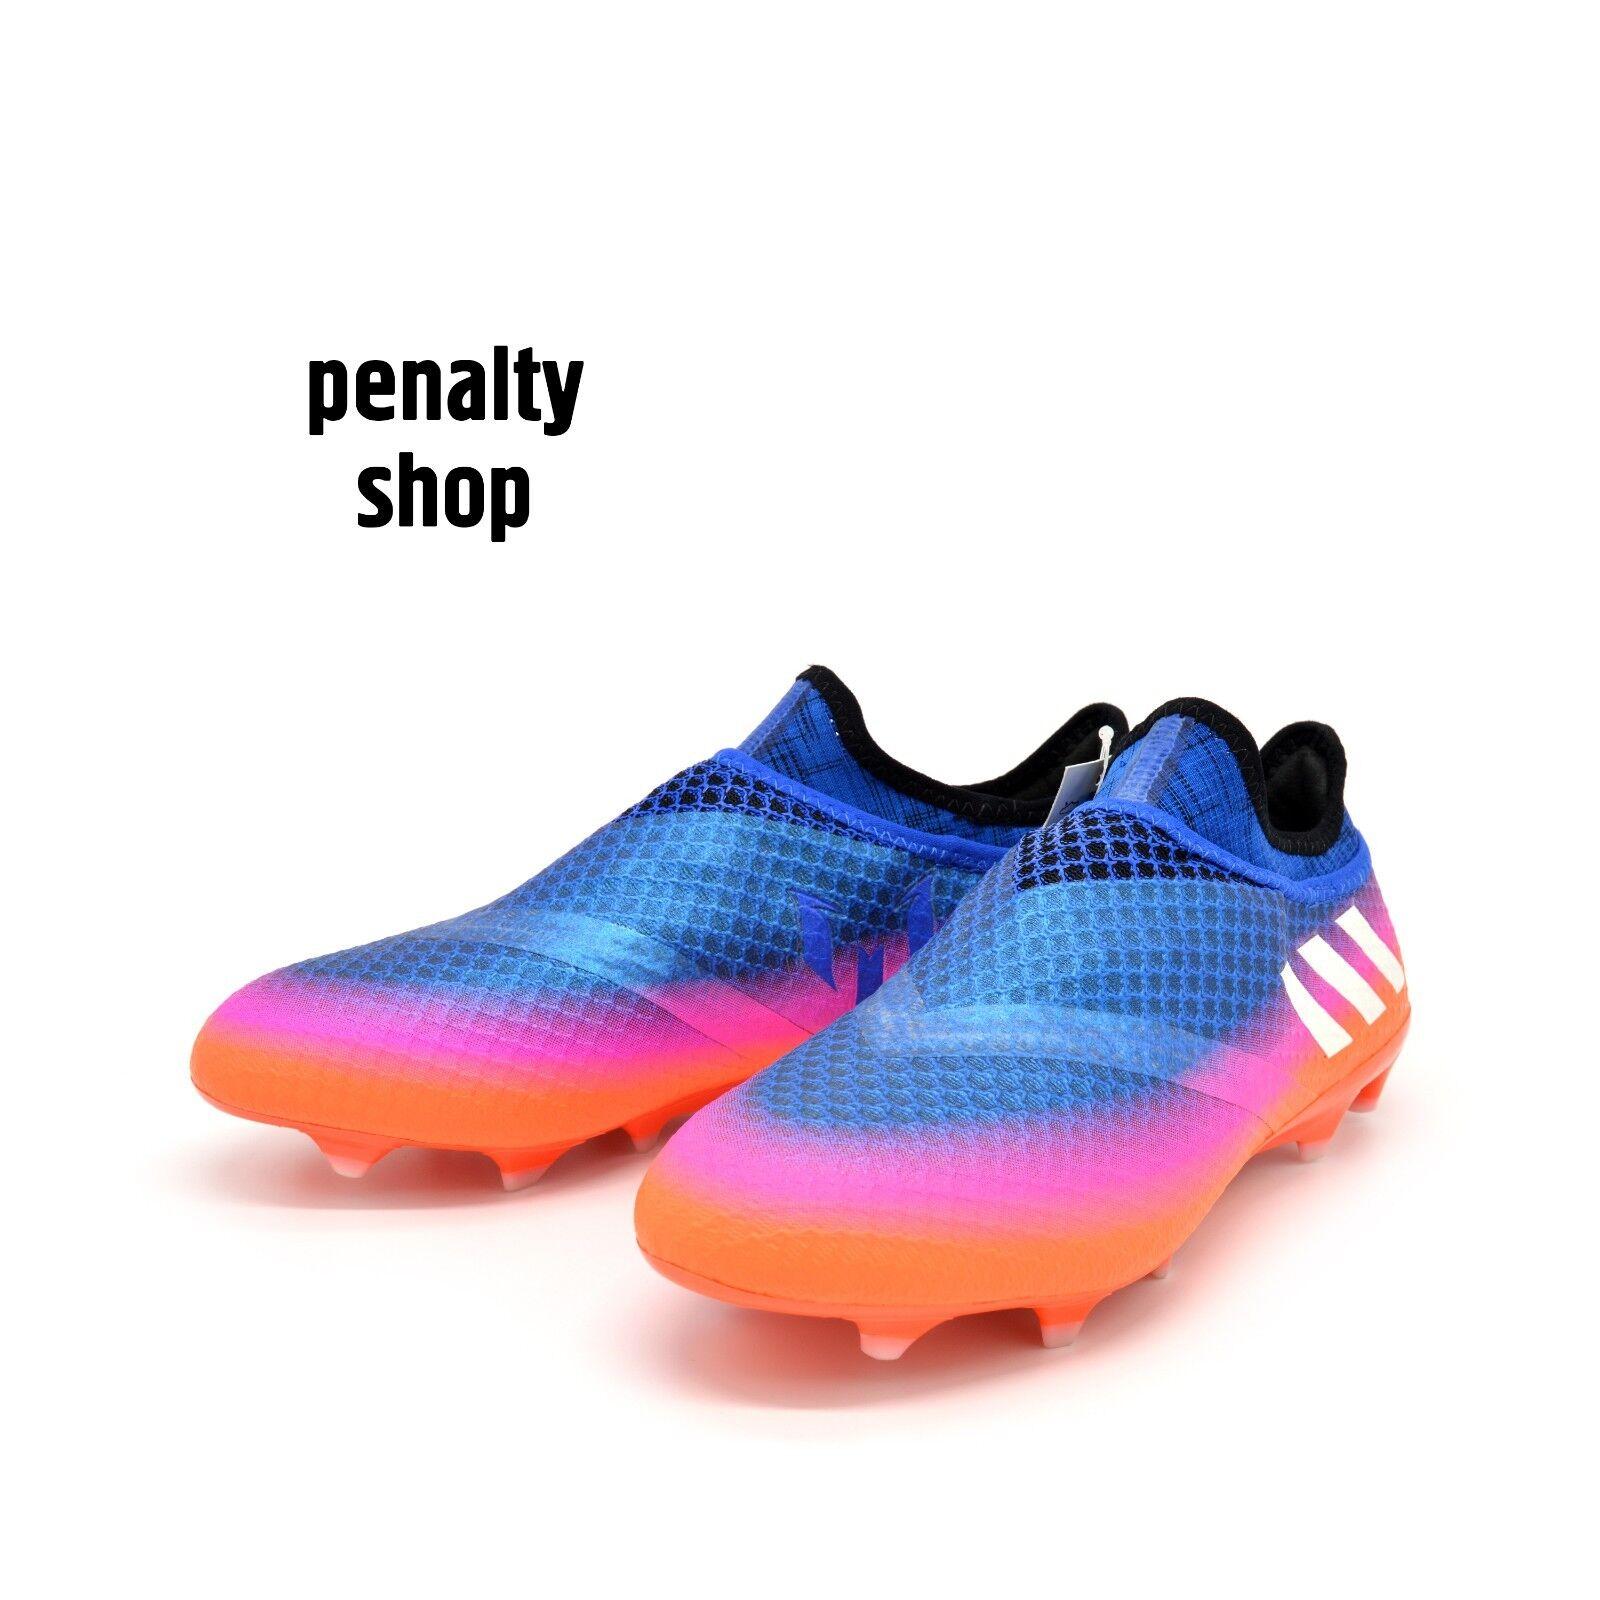 Adidas Messi 16+ Pureagility FG AG BB1871 RARE RARE RARE Limited Edition 25e7d9